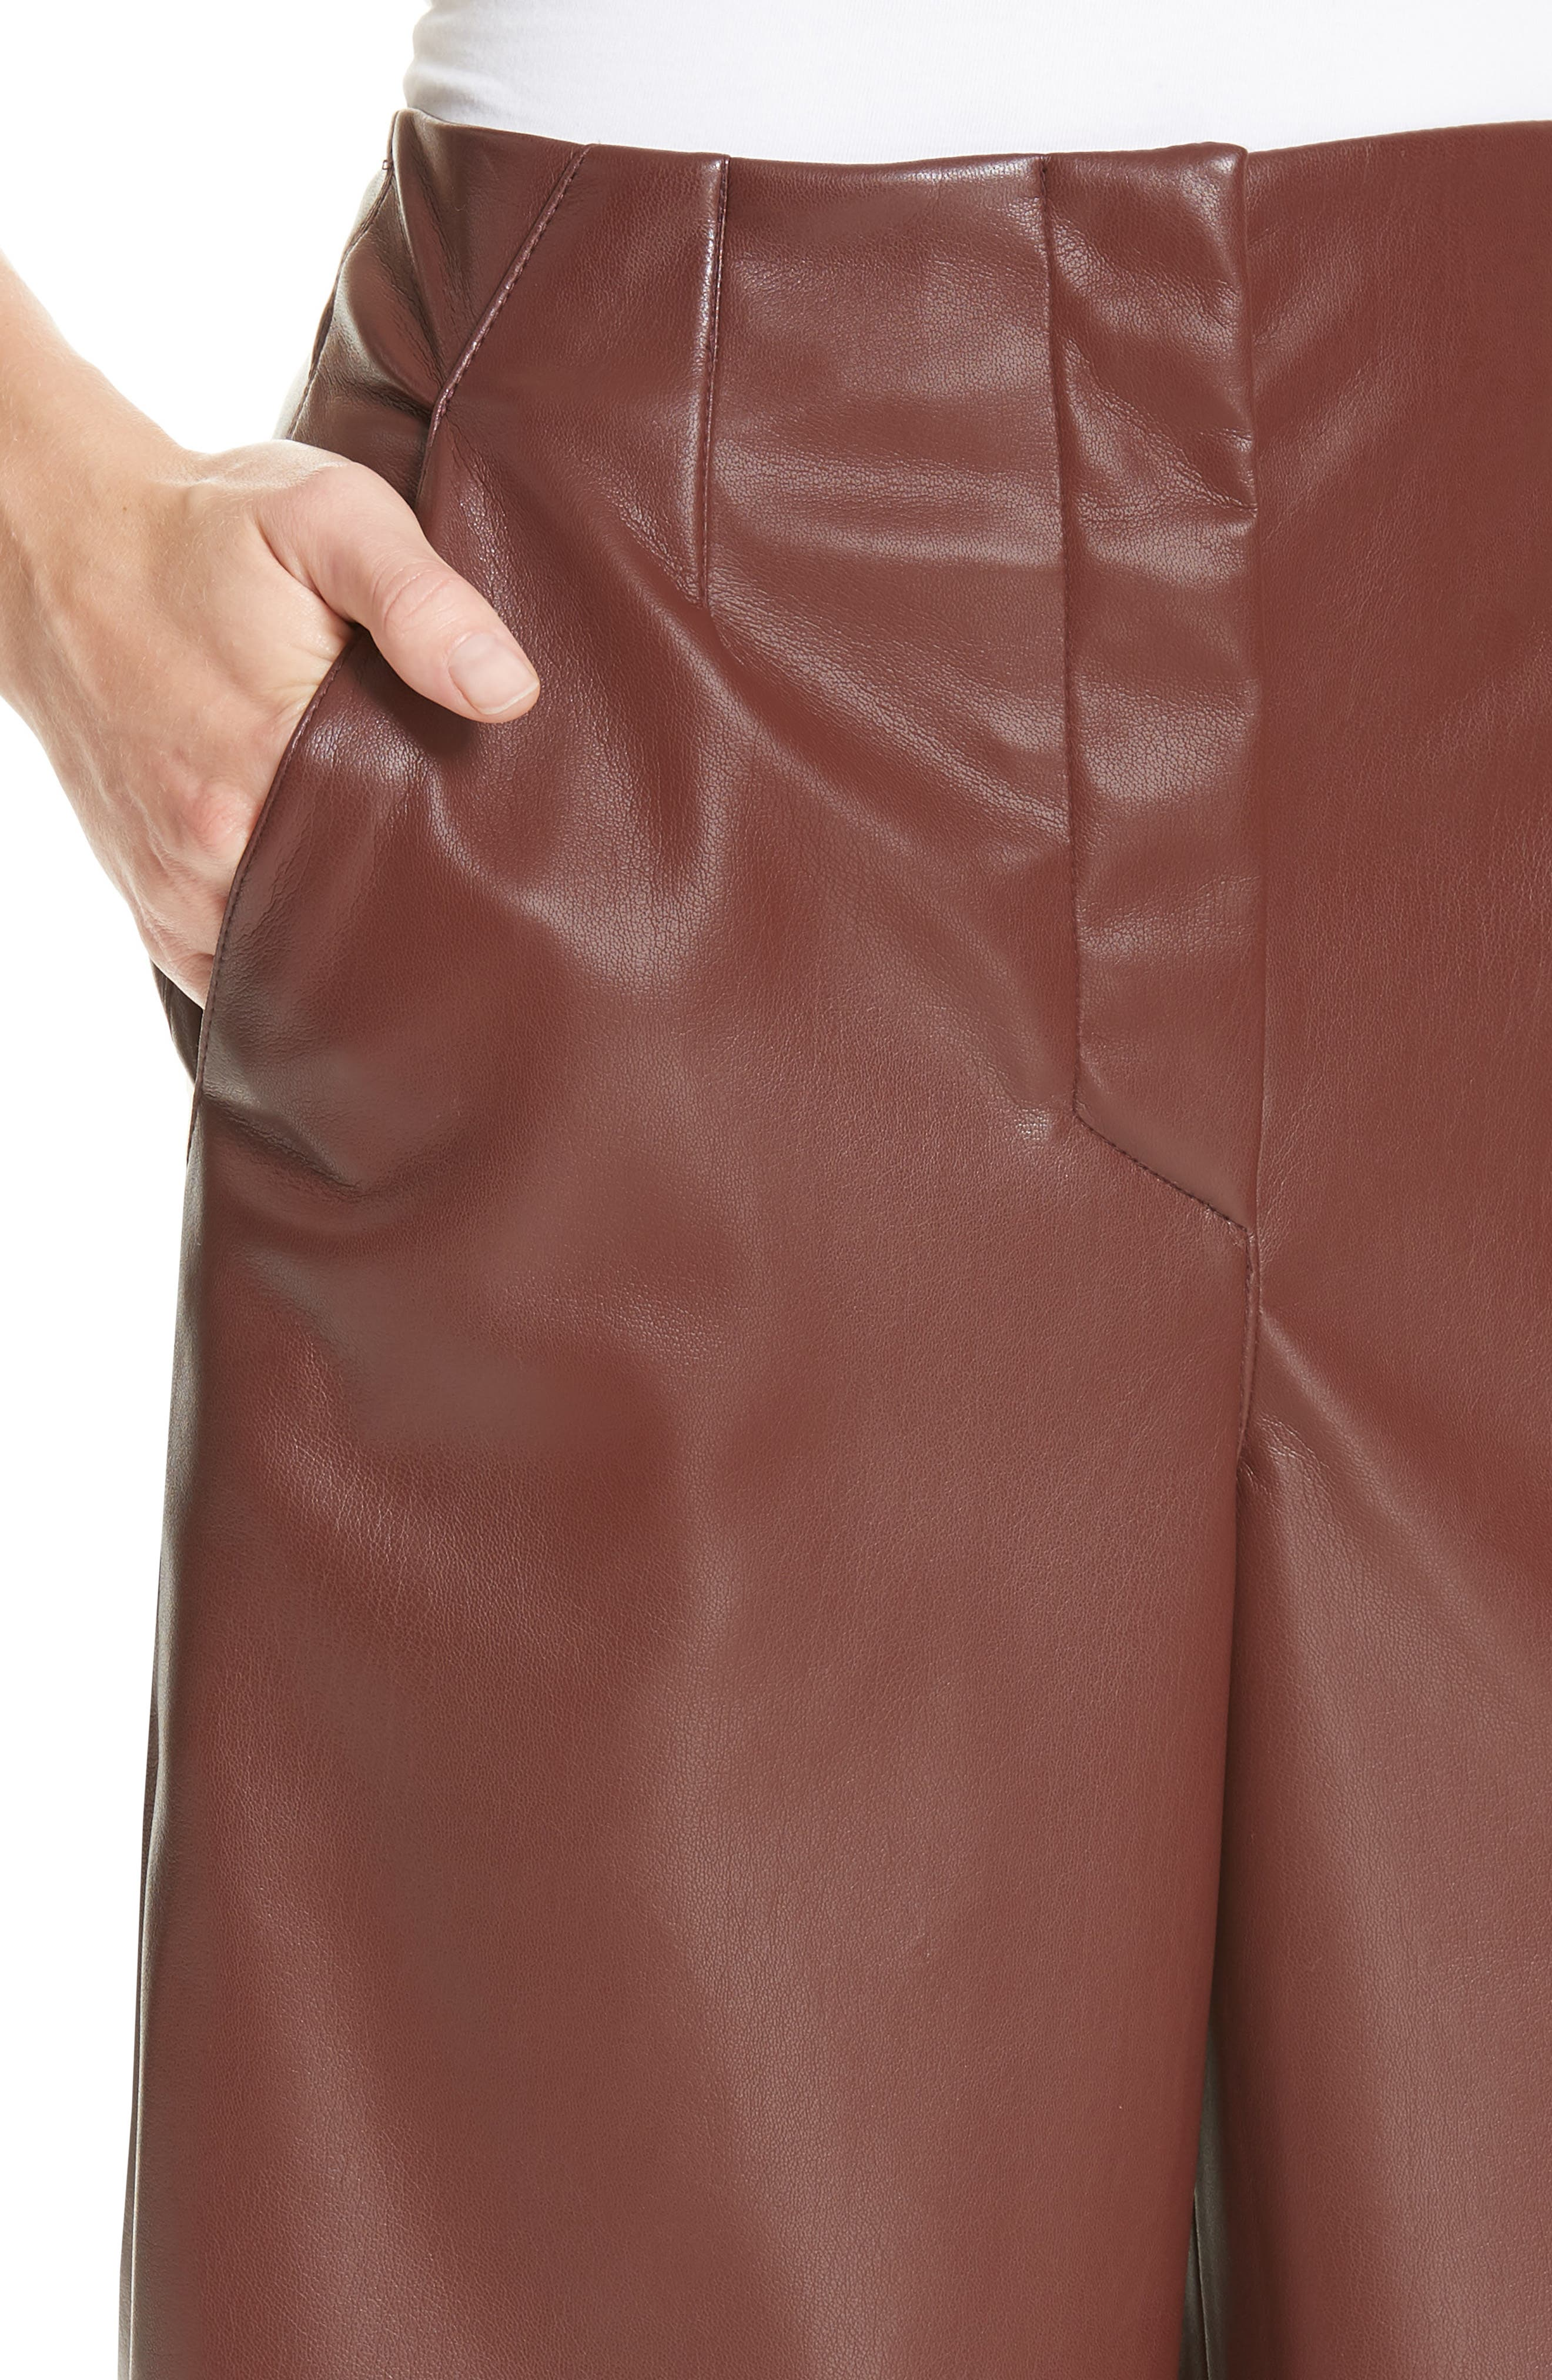 Africa Faux Leather Wide Leg Crop Pants,                             Alternate thumbnail 4, color,                             PLUM CHUTNEY